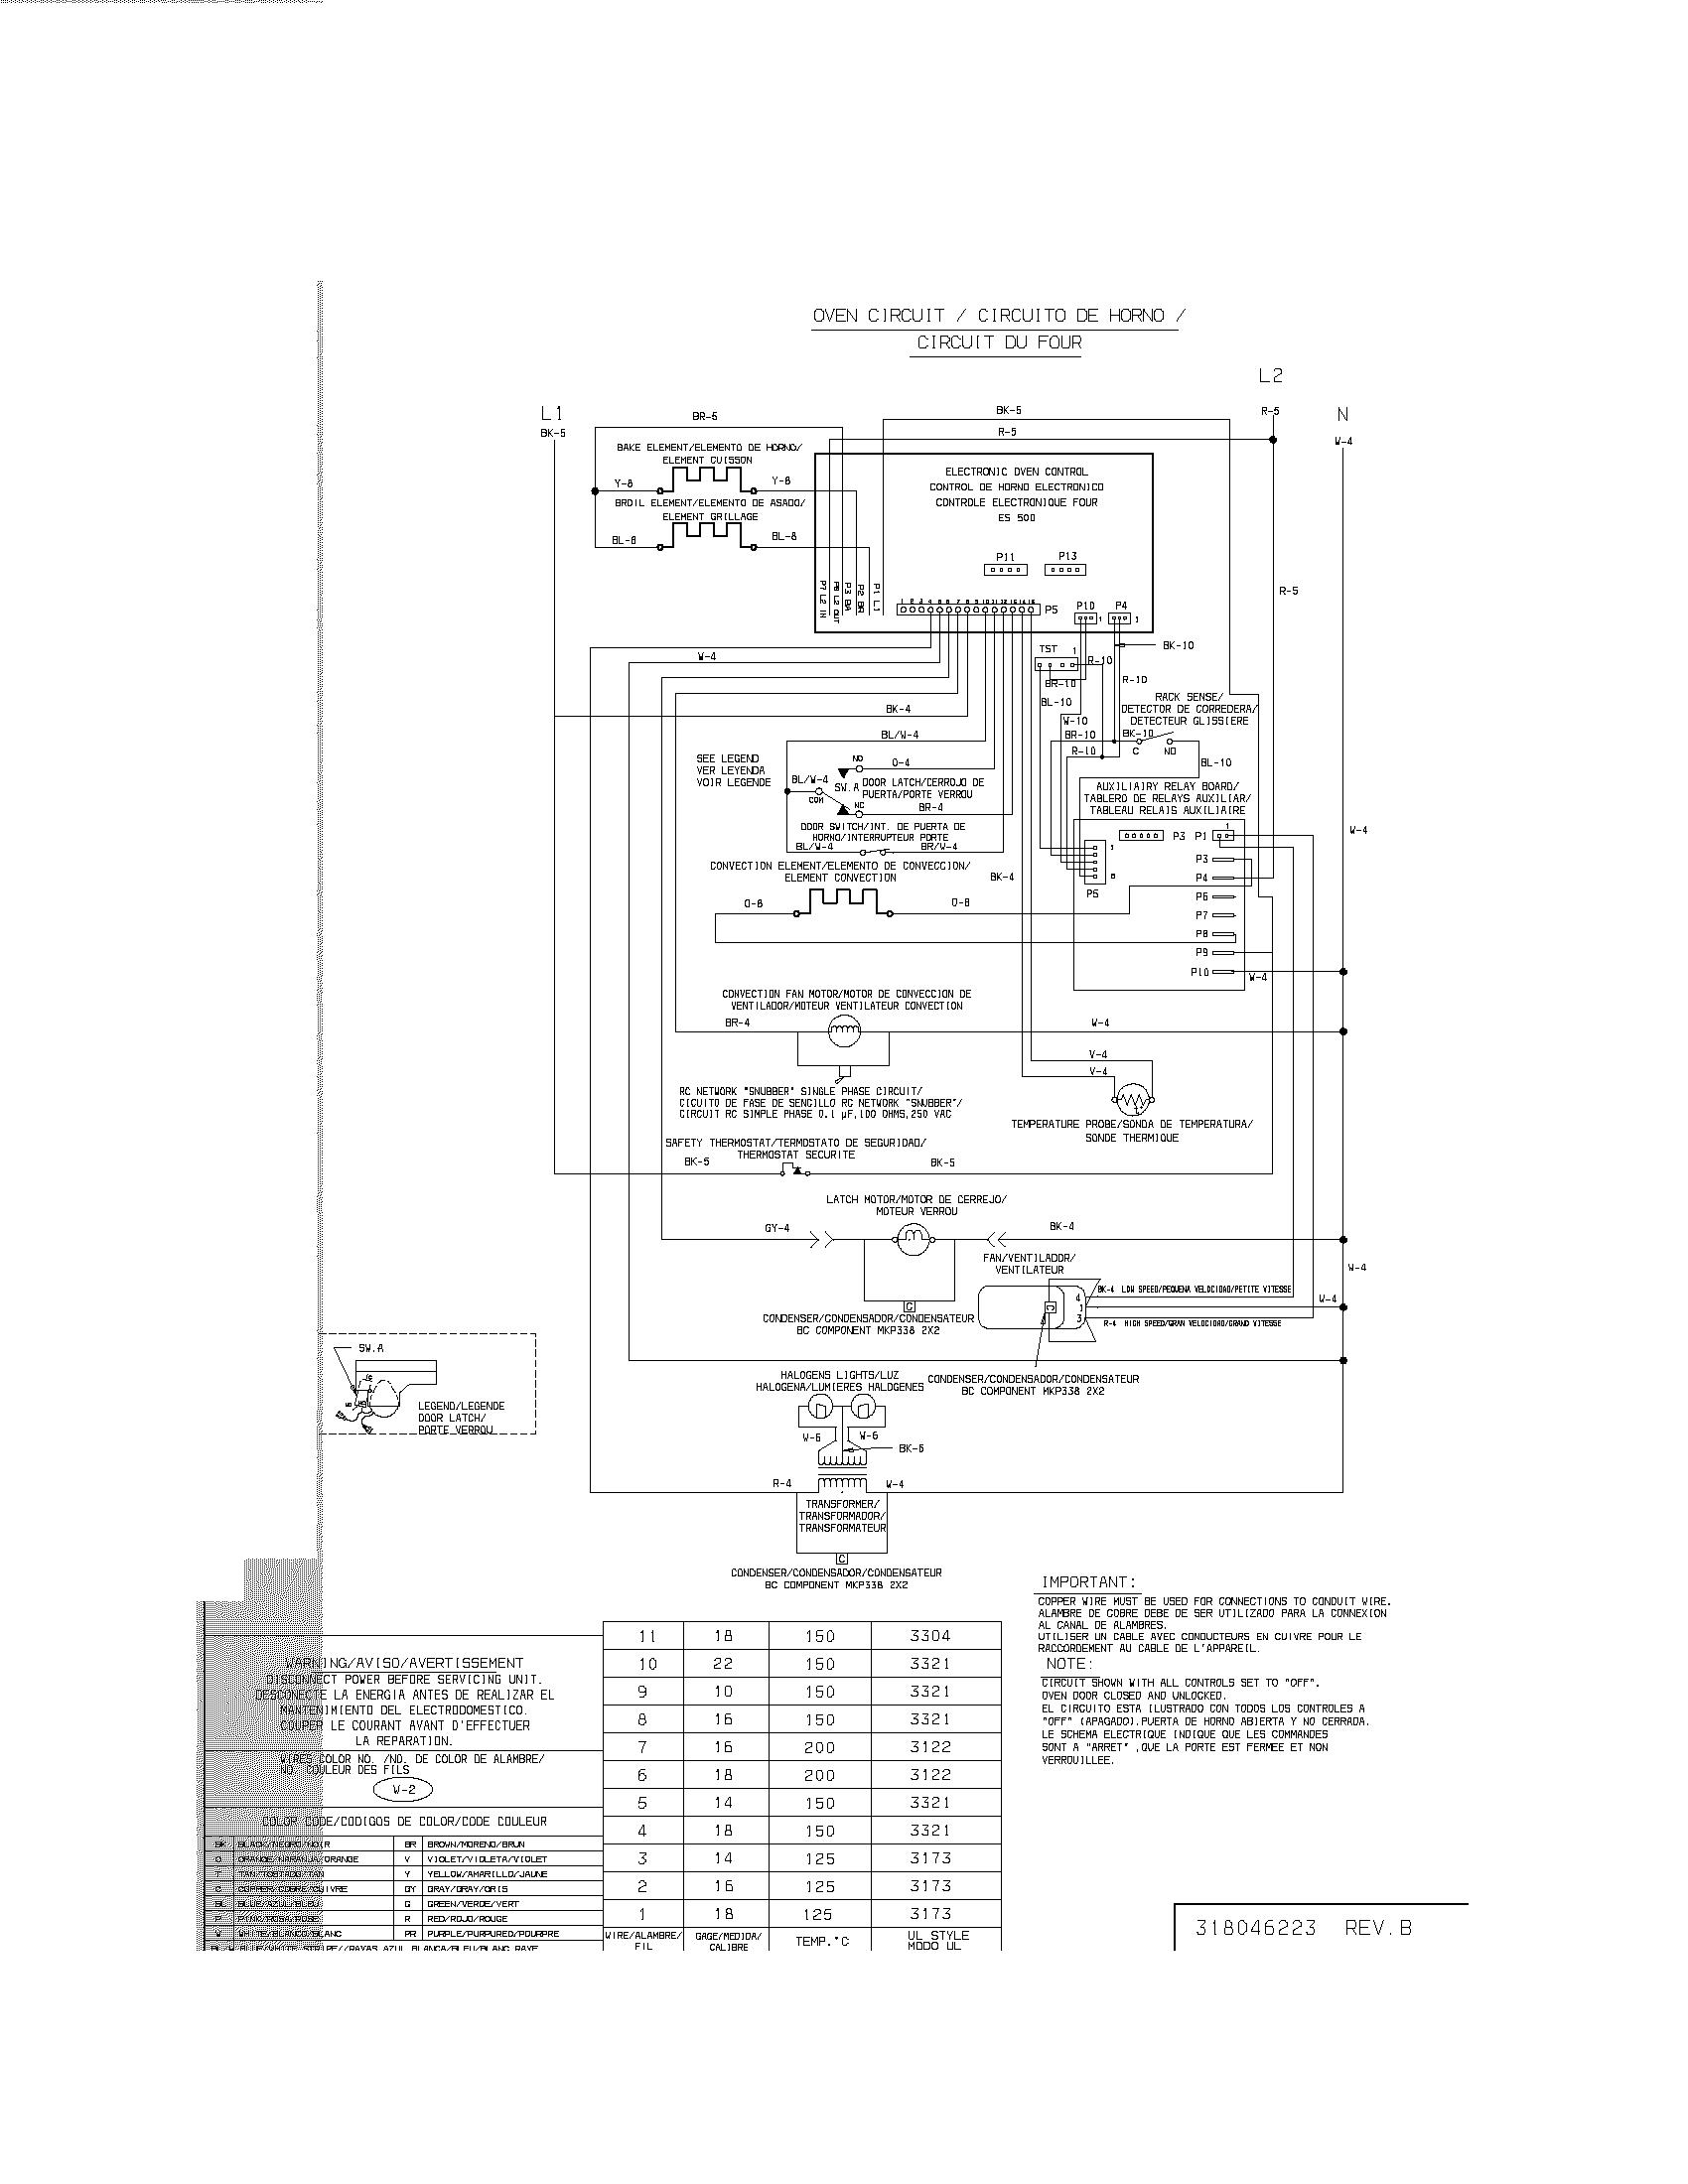 Oreck xl 2500 wiring diagram wiring diagram wiring diagram oreck xl 988 wiring diagram oreck handle wiring diagram for oreck xl 2500 wiring diagram asfbconference2016 Choice Image